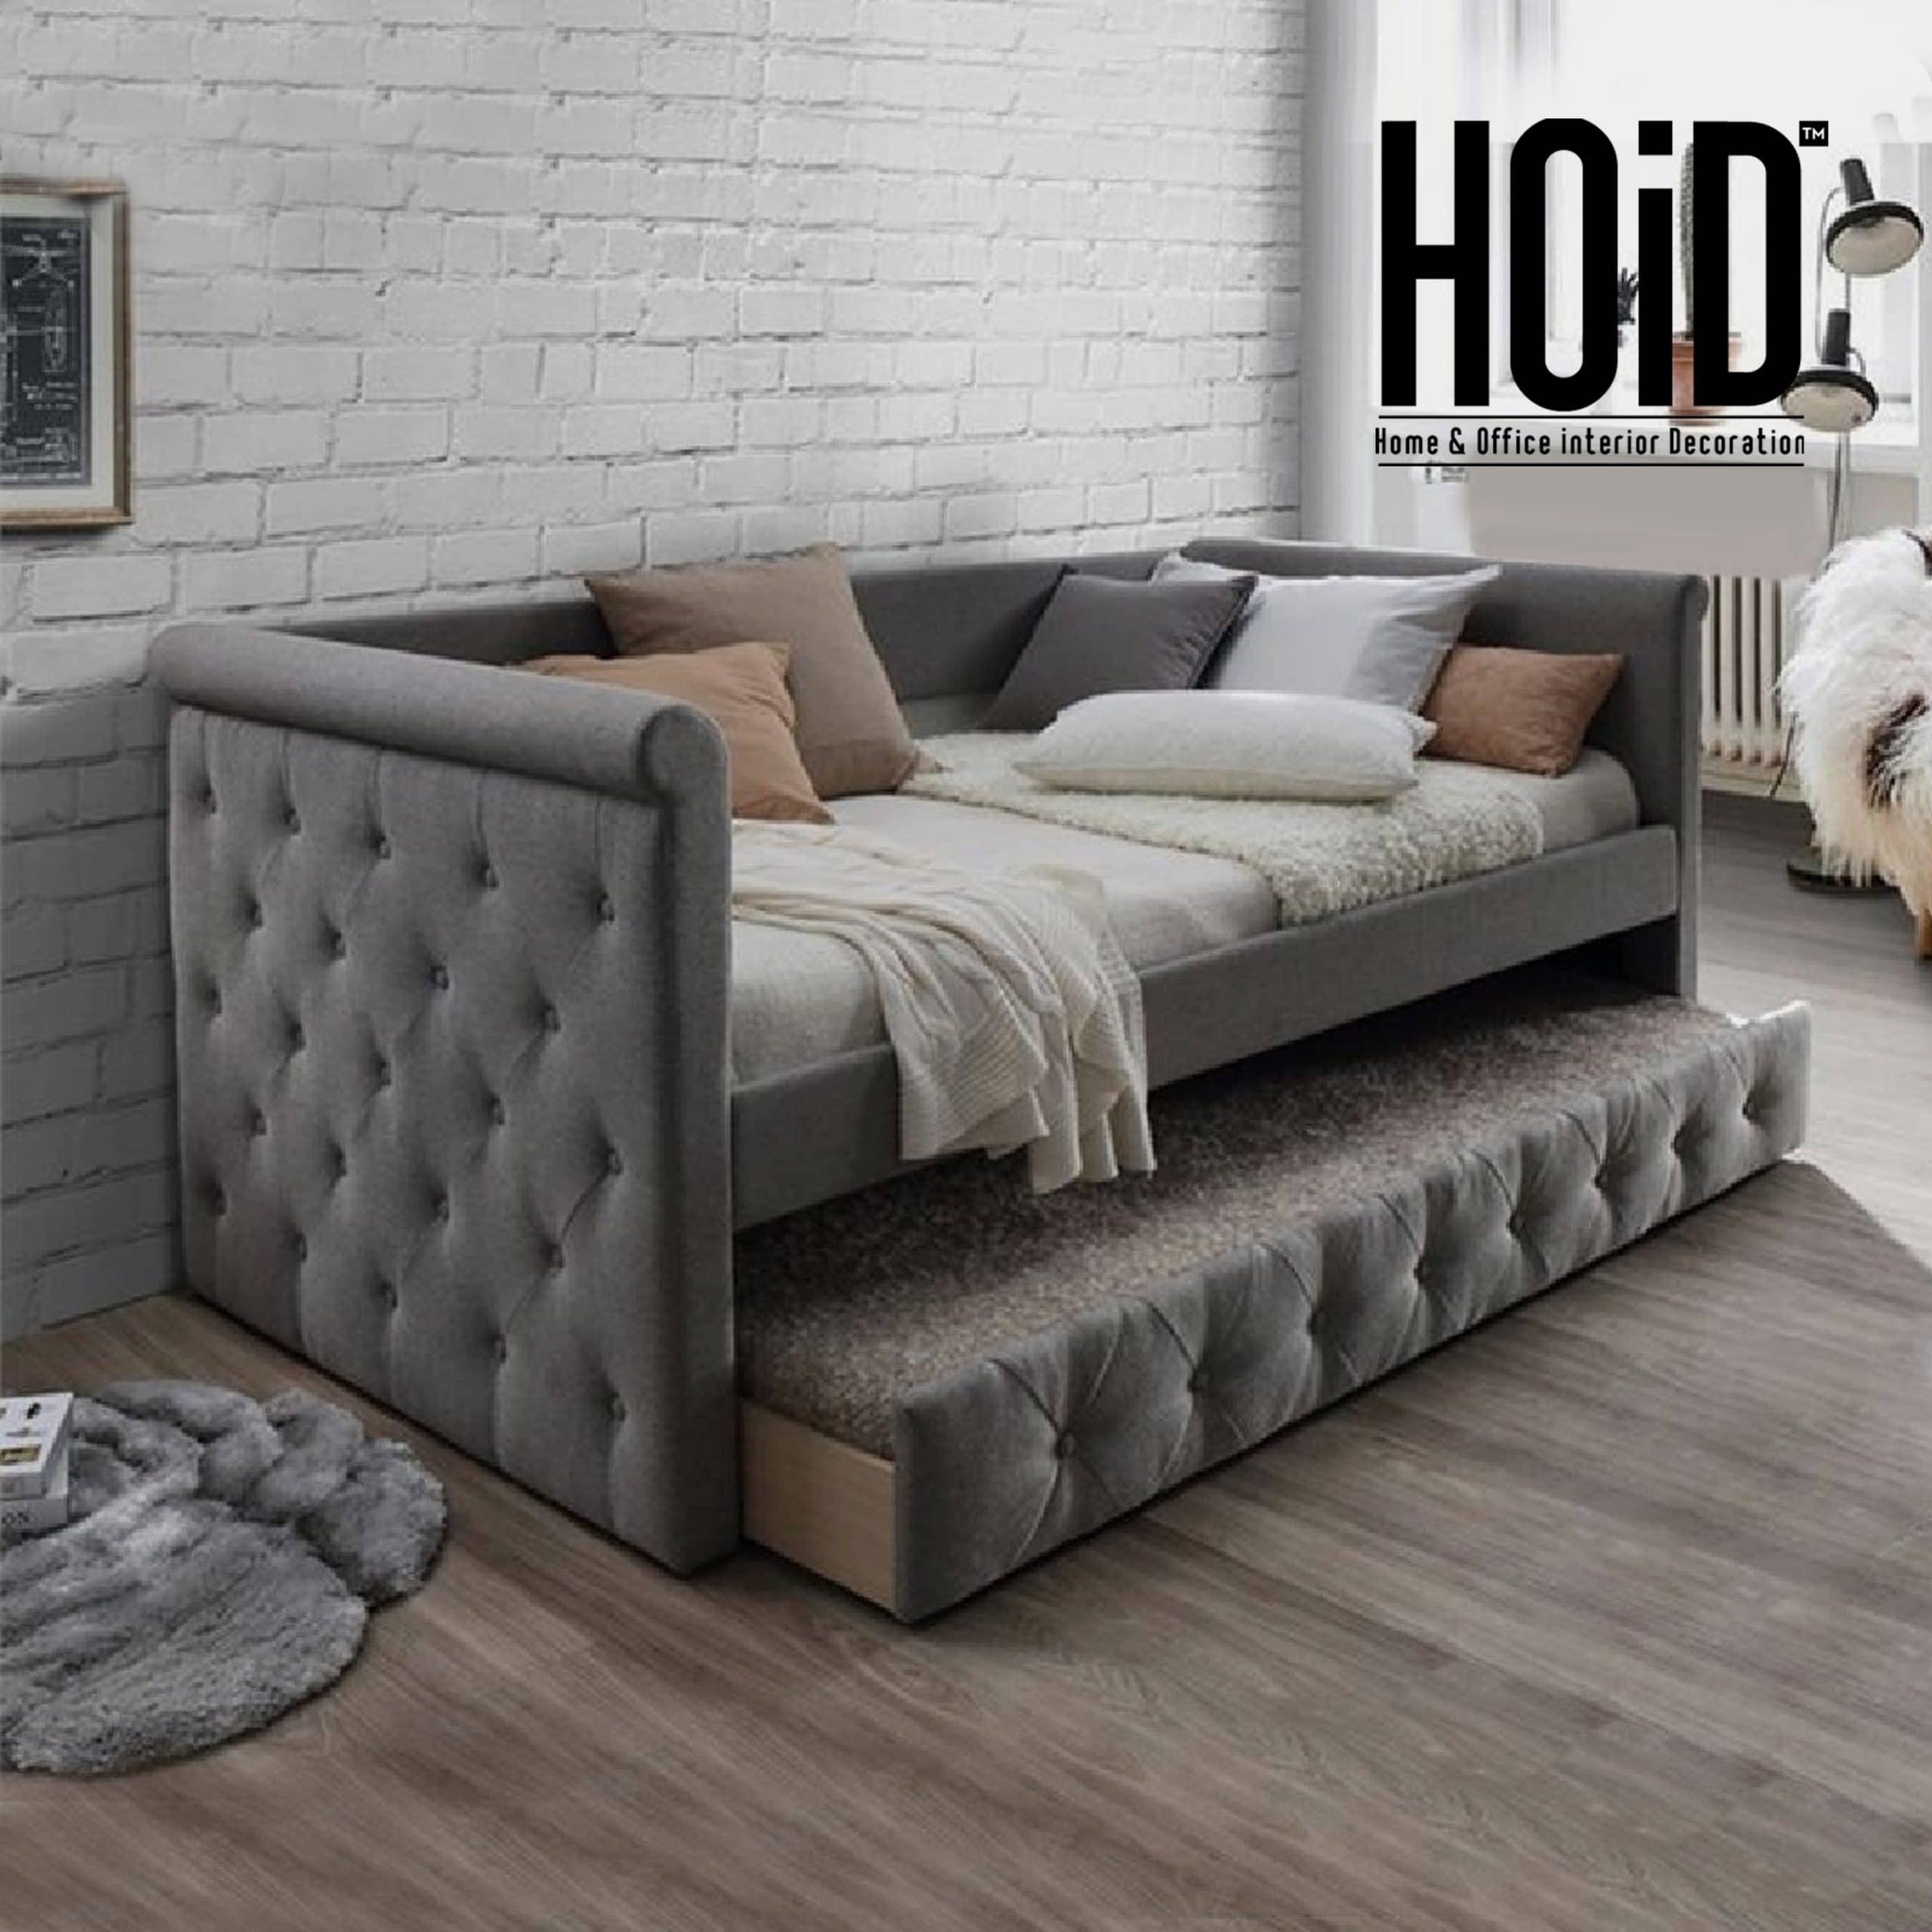 Use 3 Seater Sofa Multi Purpose Seater Bunk Bed Sofa With 2 Mattresses Hoid Pk